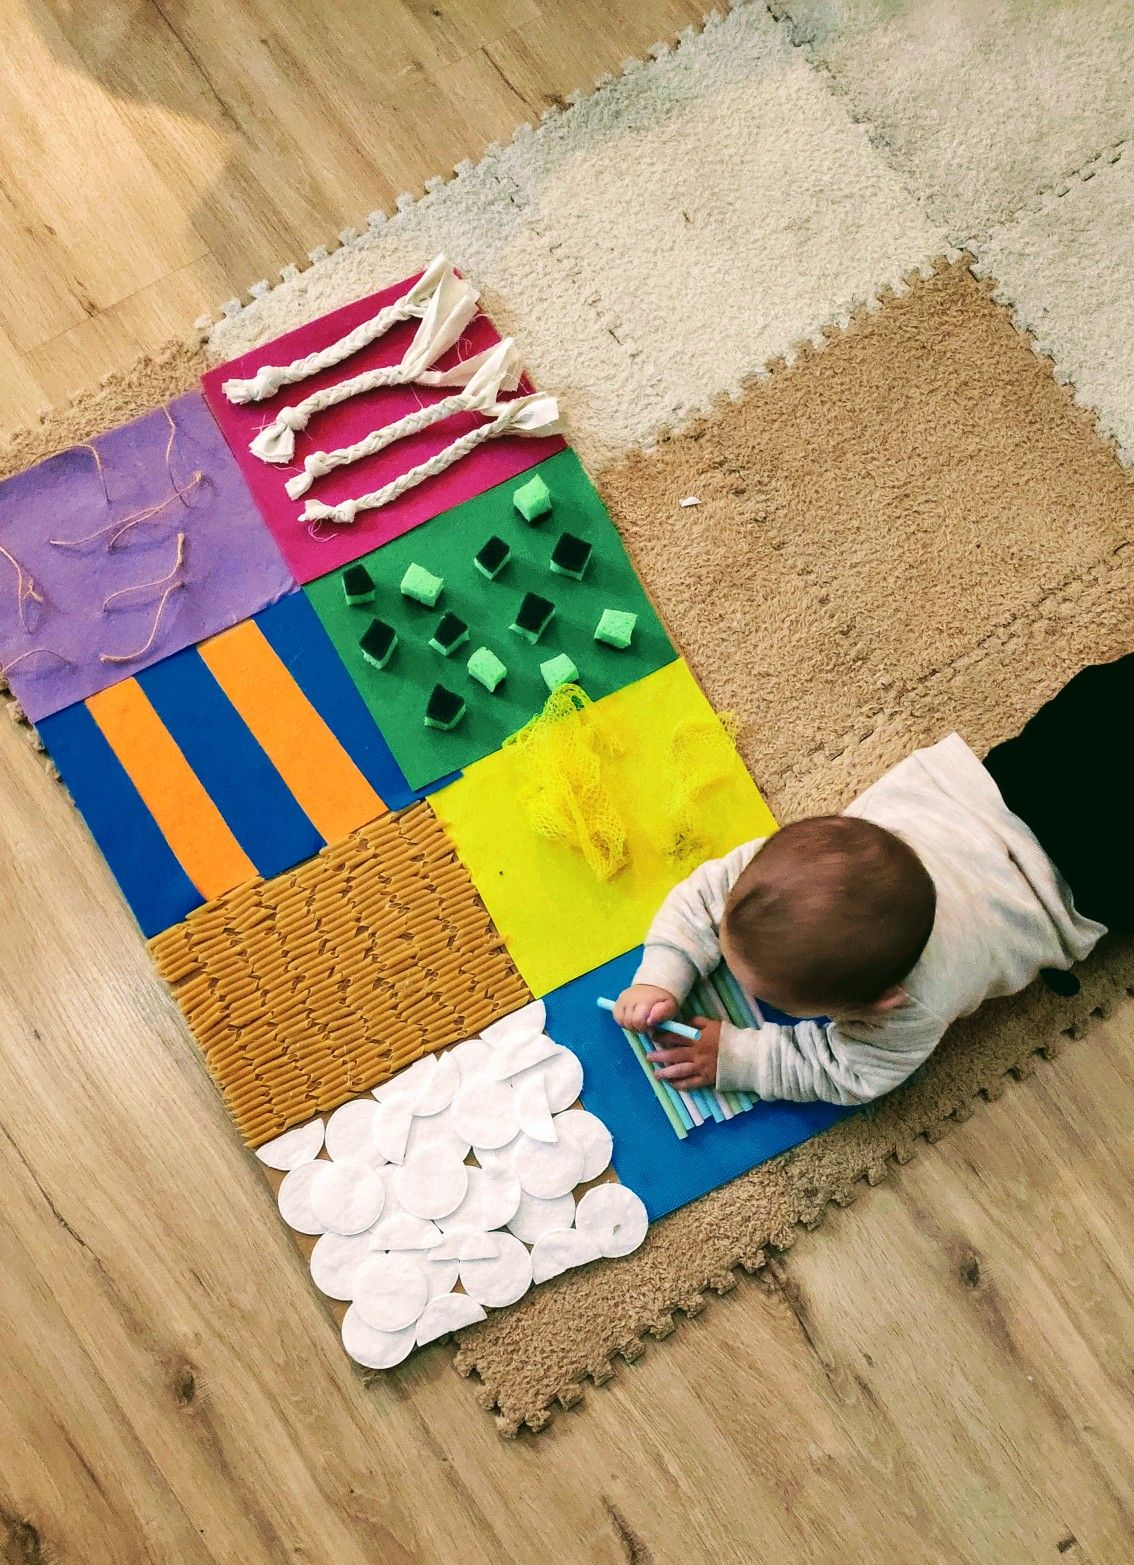 Alfombra Sensorial Alfombras Diy Montessori Bebe 6 Meses